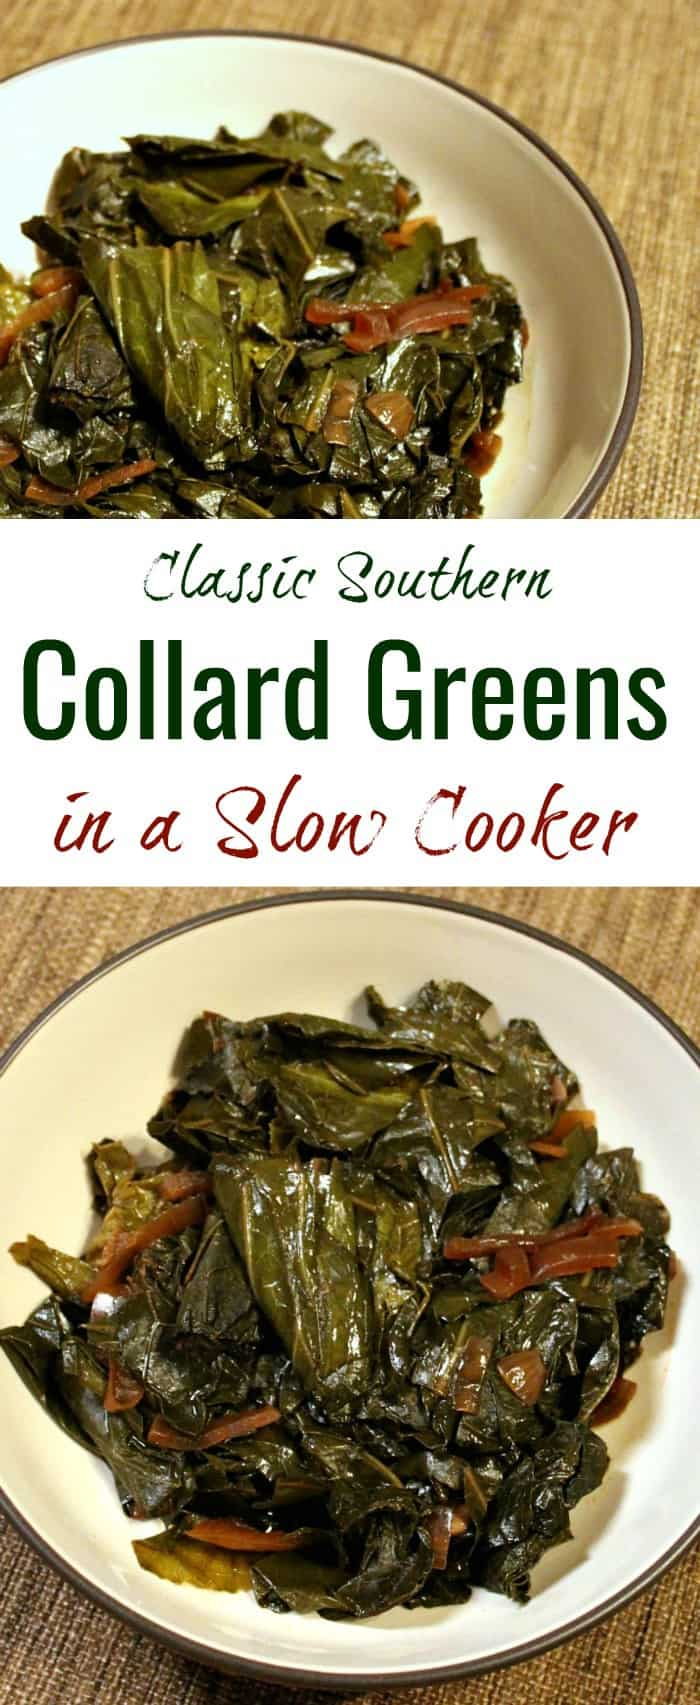 Classic Southern vegan collard greens recipe | vegan collard greens